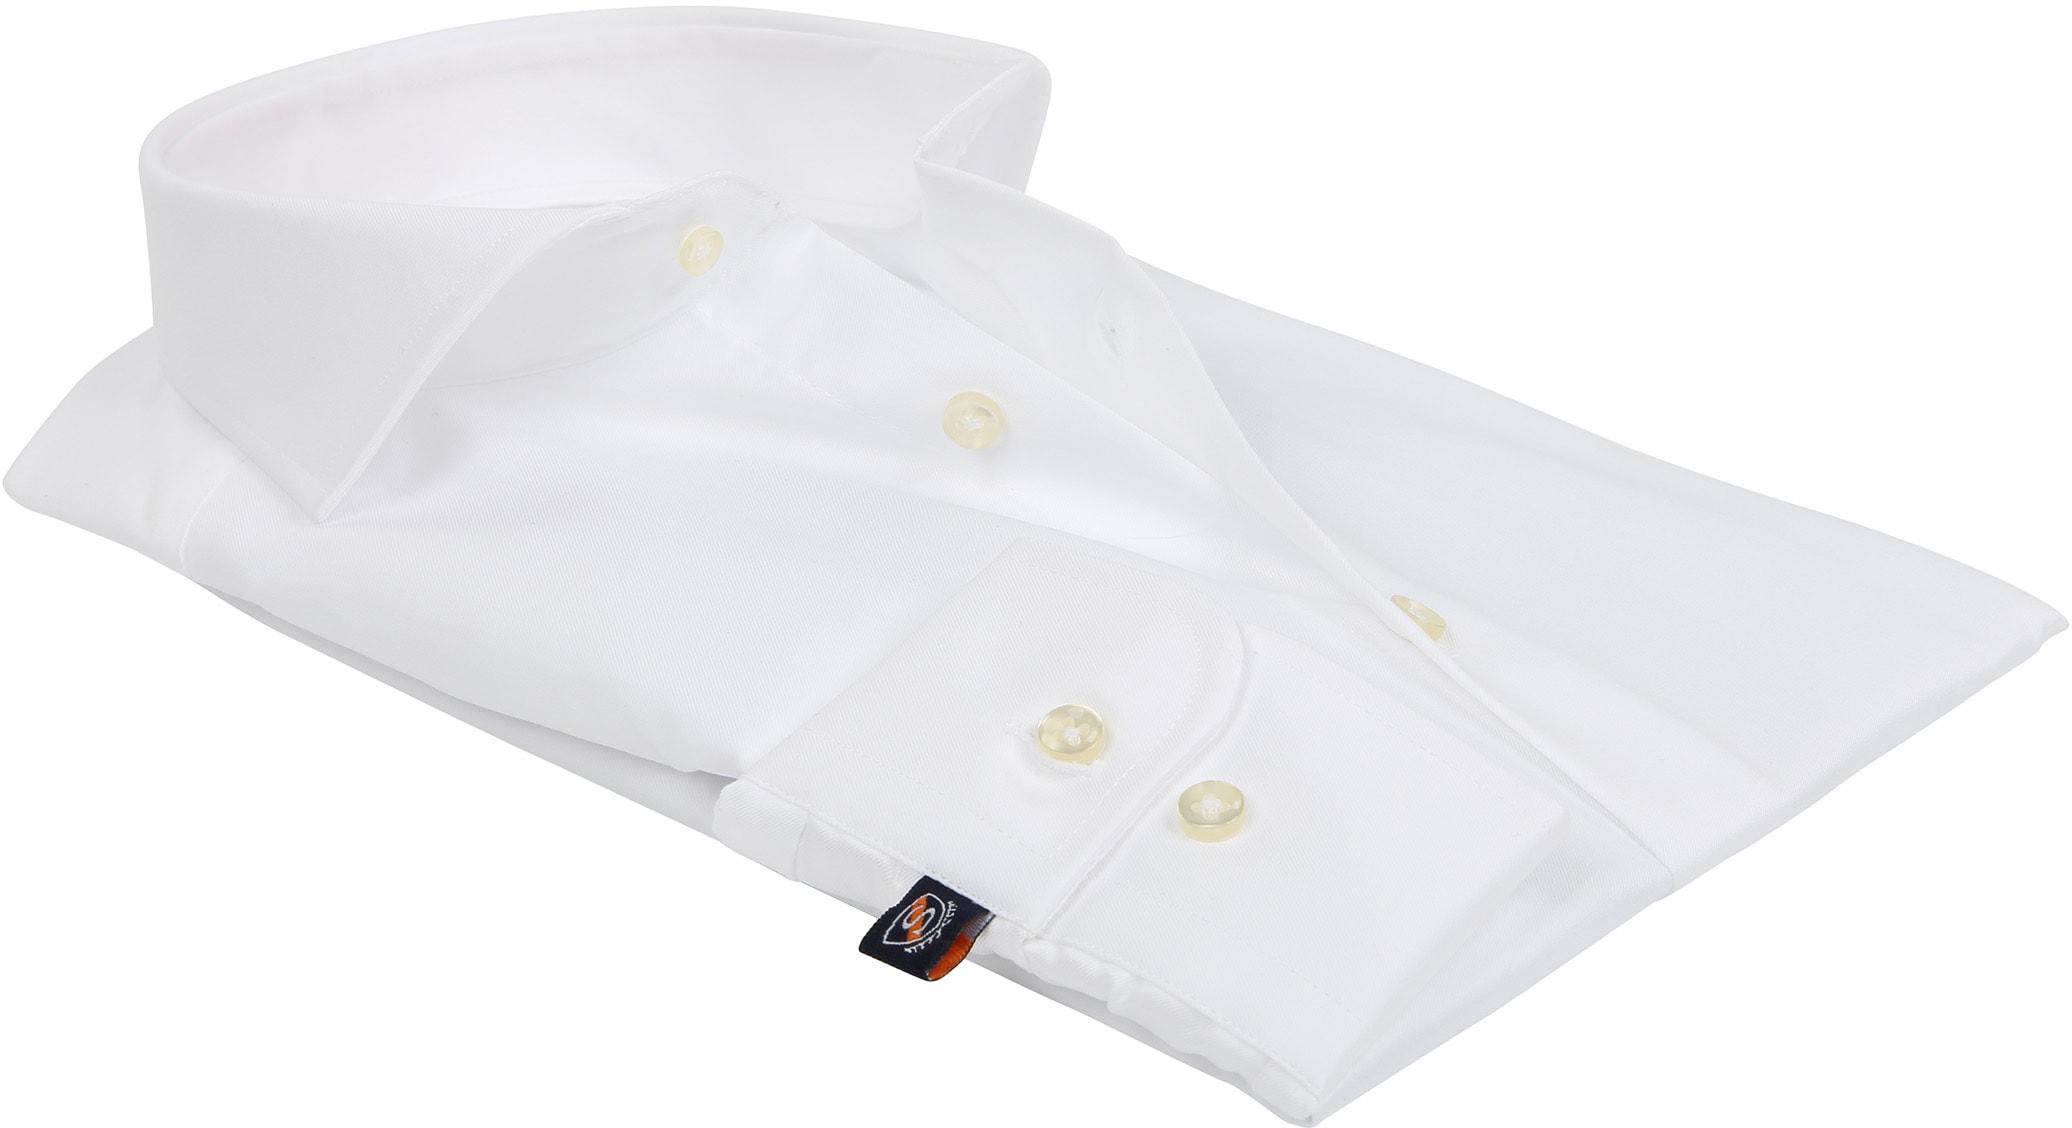 Suitable Overhemd SL7 Wit 180-1 foto 3